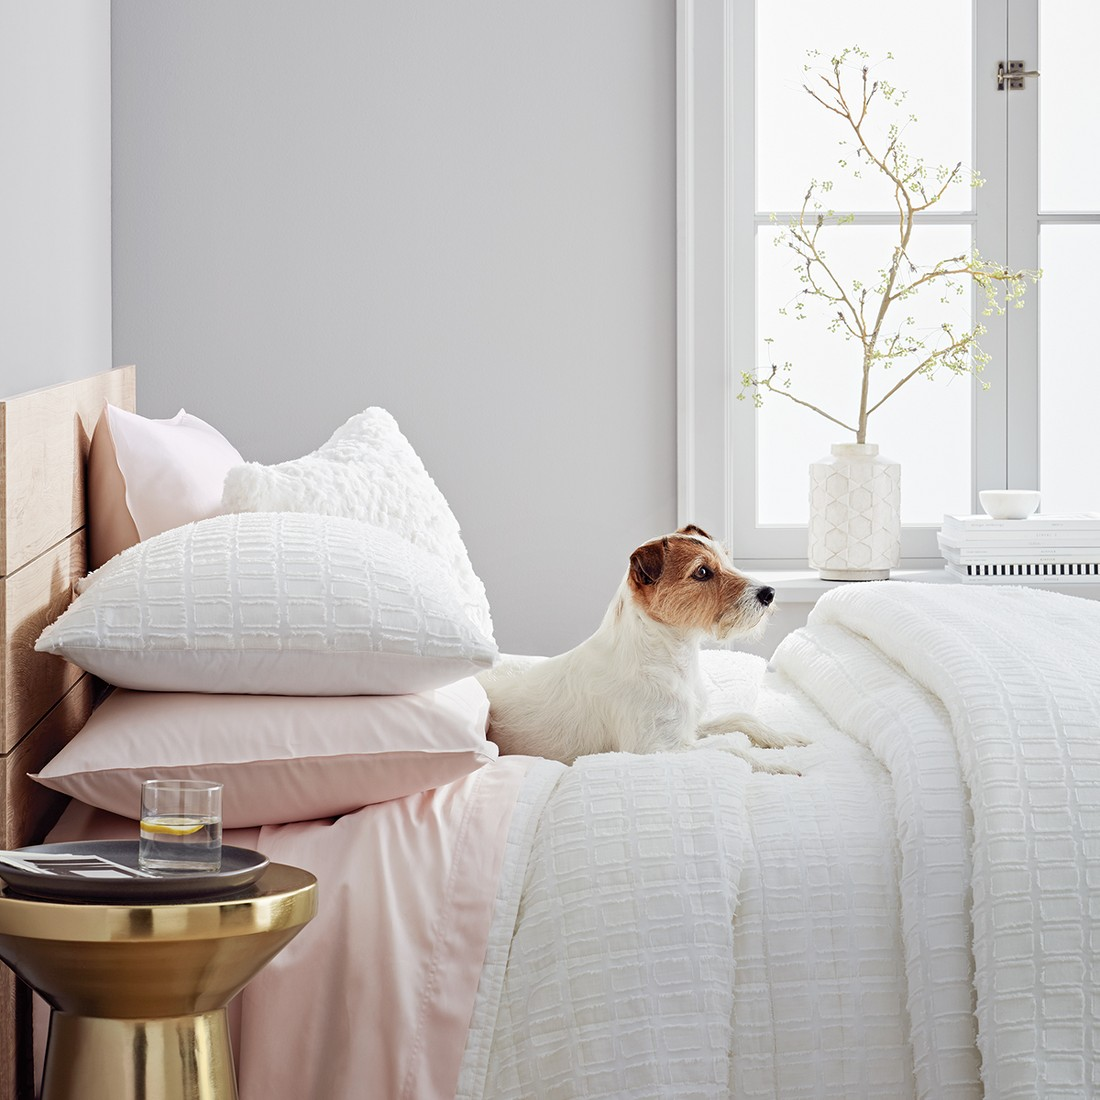 Home Inspiration: Home Ideas, Design & Inspiration : Target